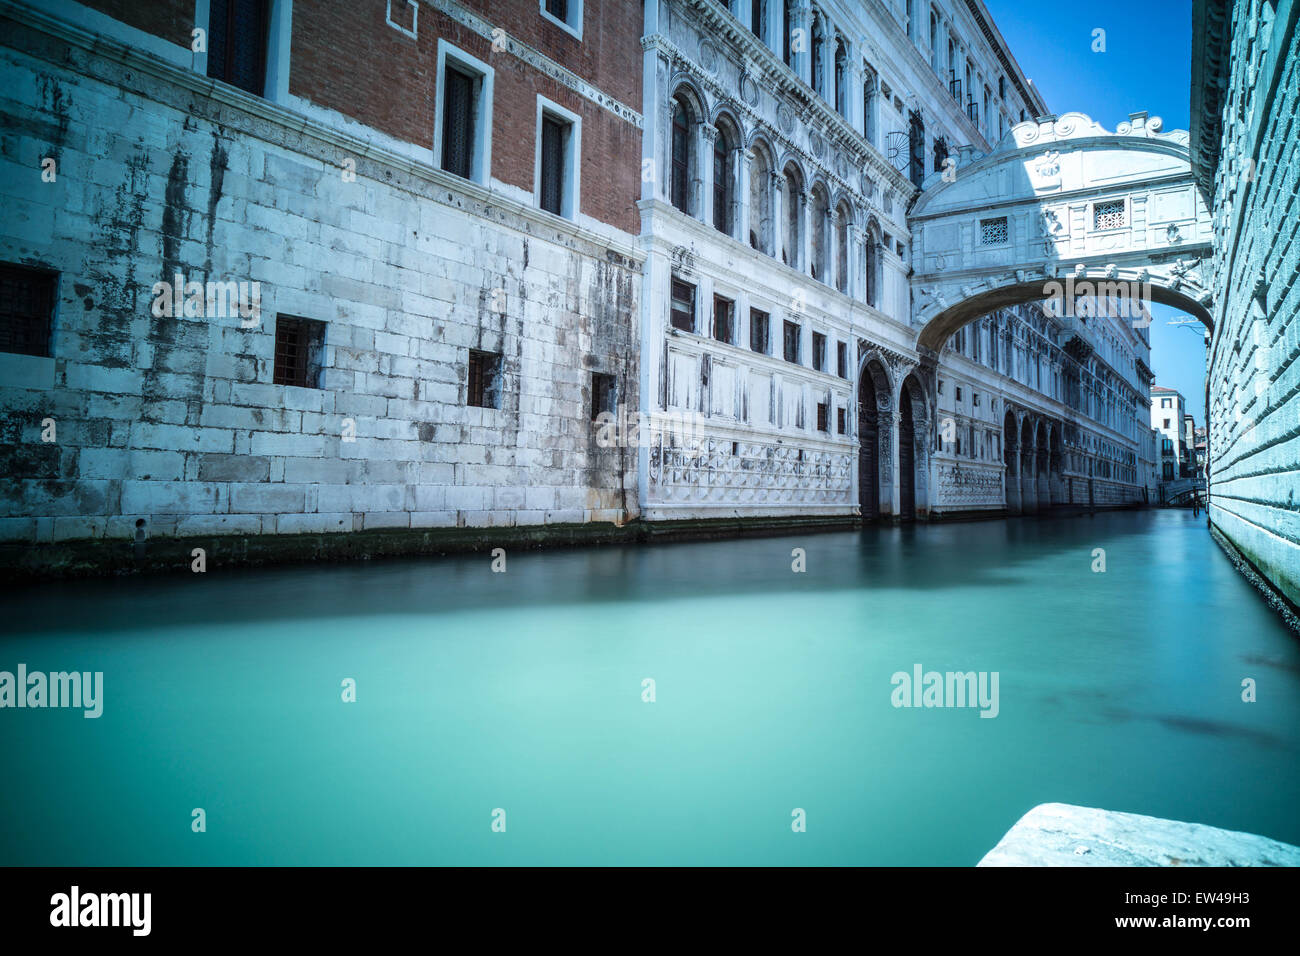 Bridge of sighs, Venice. - Stock Image